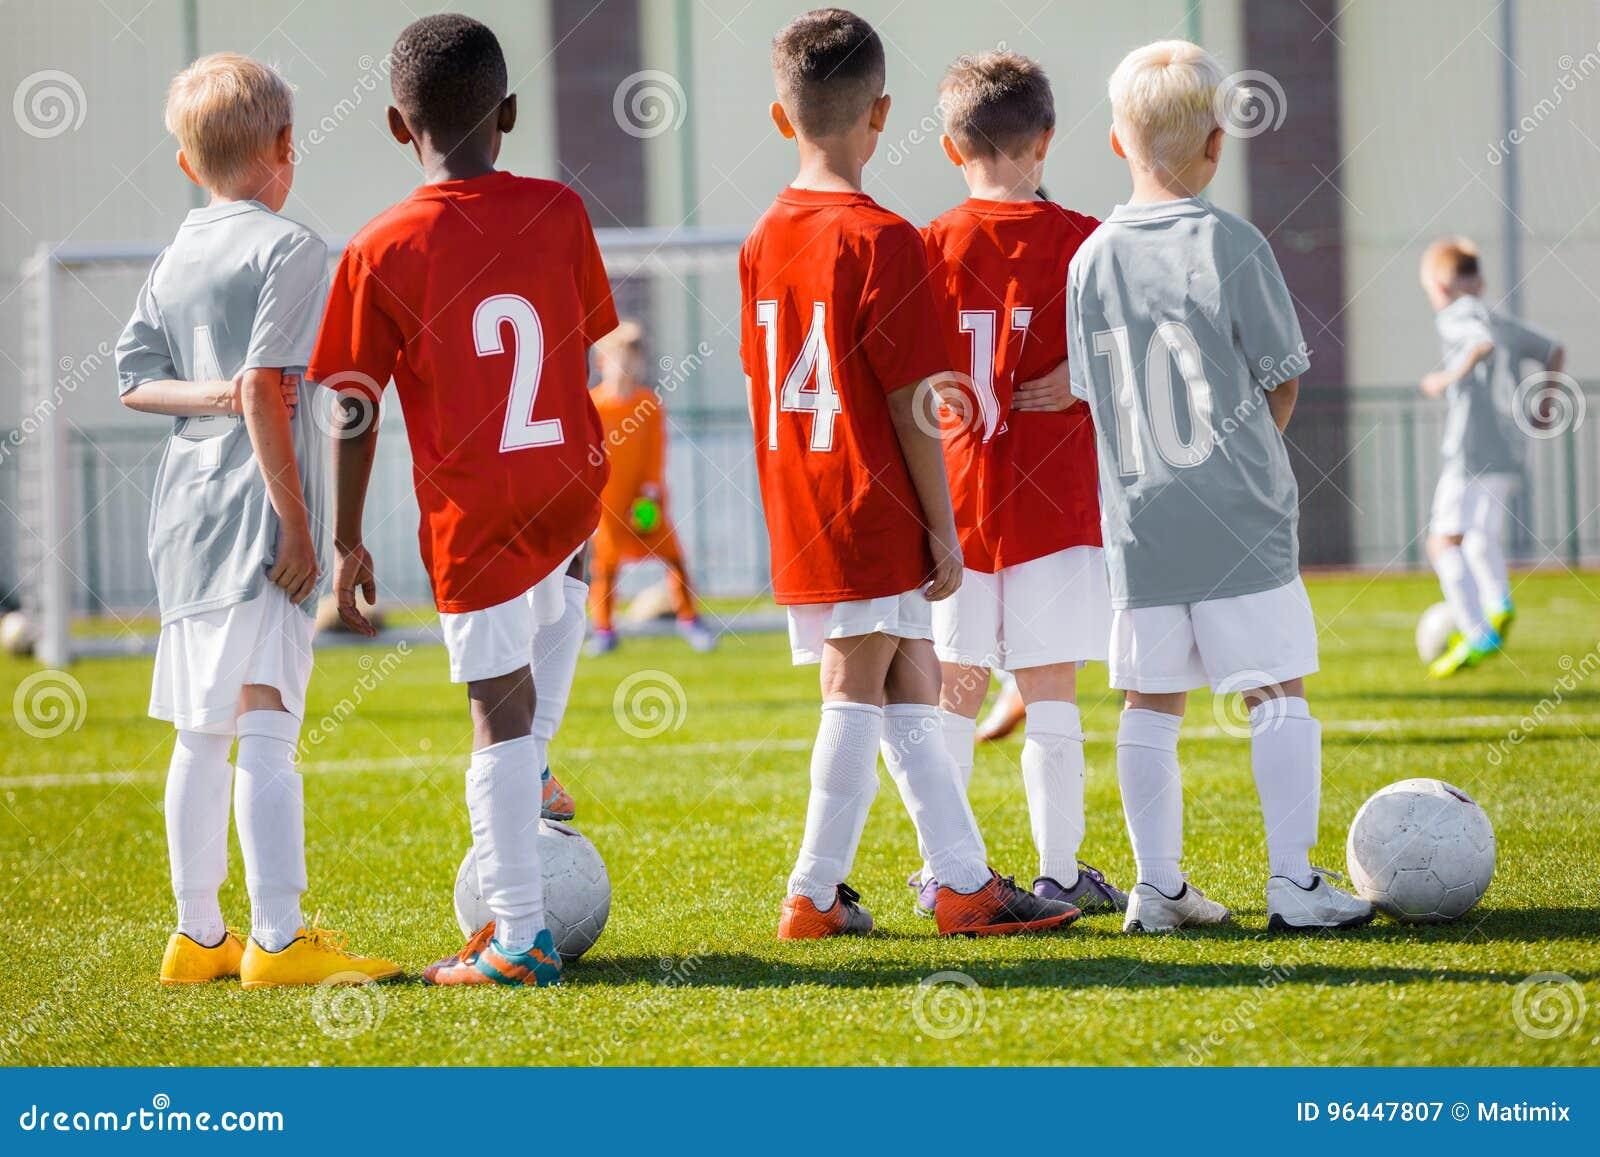 Jungen Spiel Fussball Trainings Match Kindersport Team